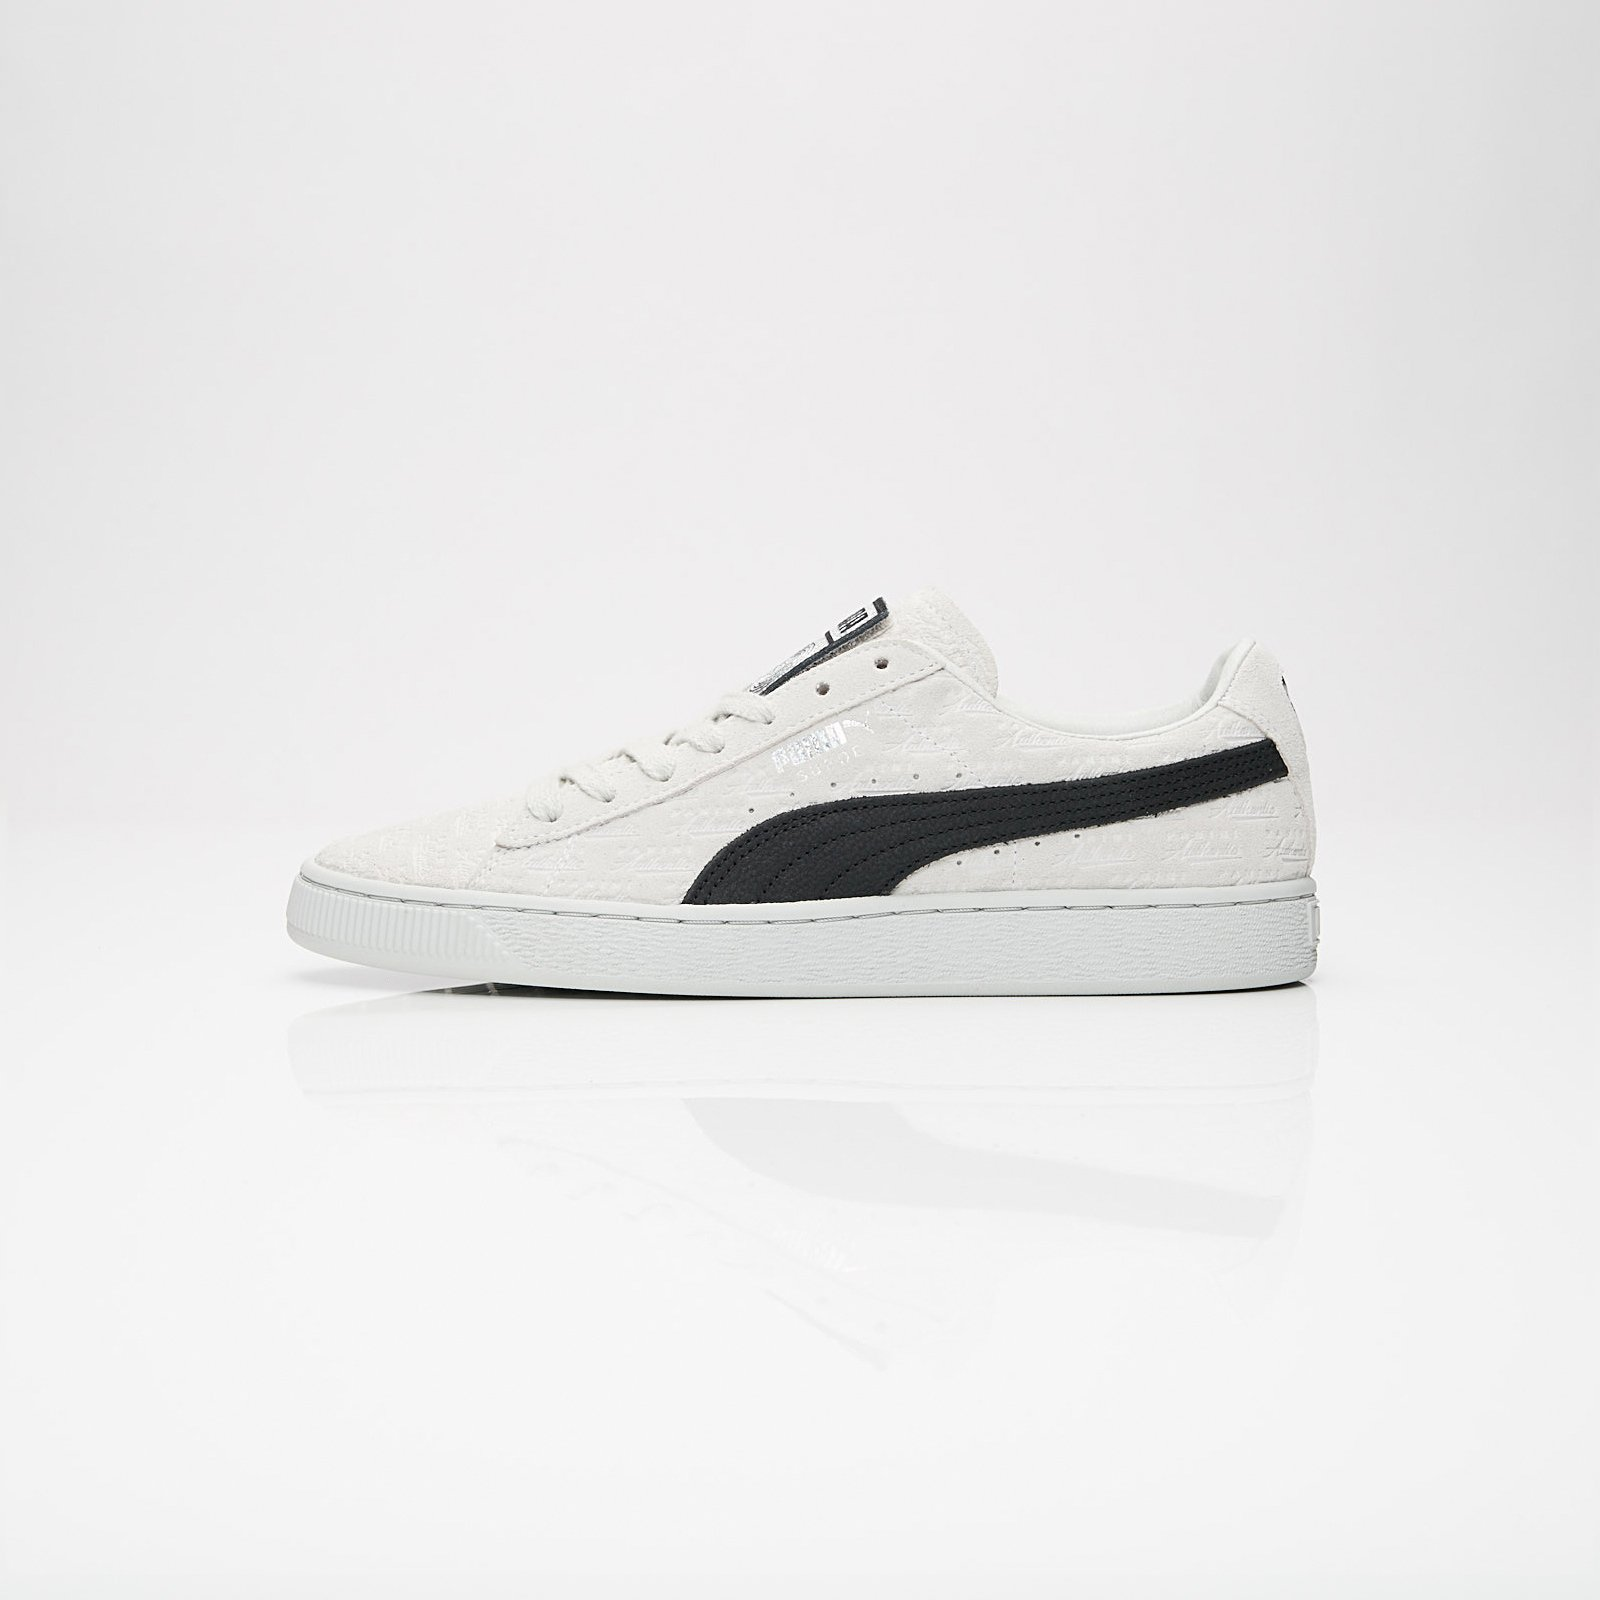 various colors bced1 0fb81 Puma Suede Classic X Panini - 366323-01 - Sneakersnstuff ...